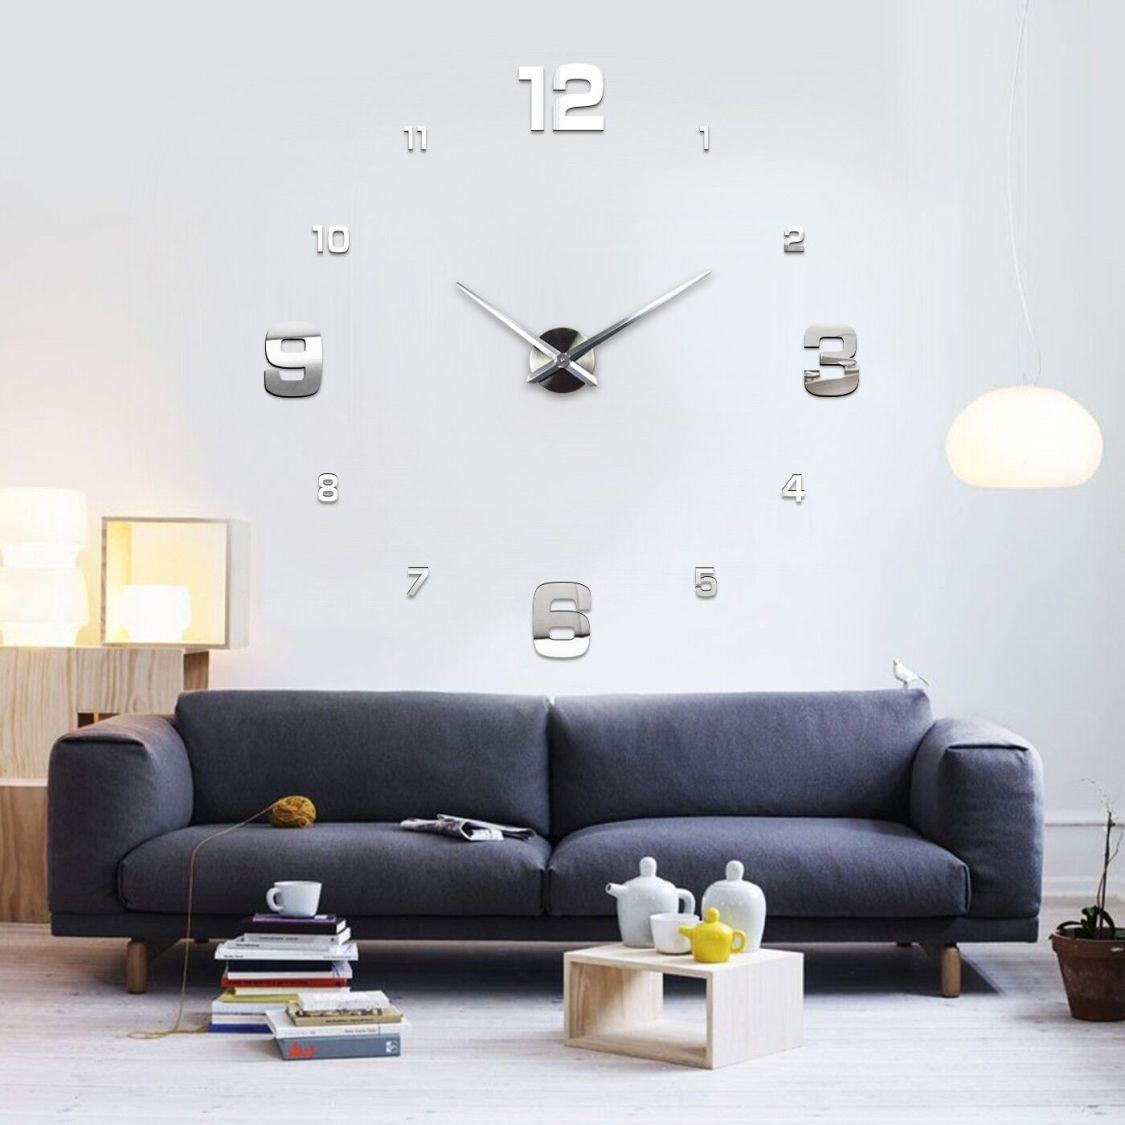 Wanduhr Uhr 3D Wandtattoo Deko Design Spiegel Edelstahl Wand Uhr Groß XXL XL C1